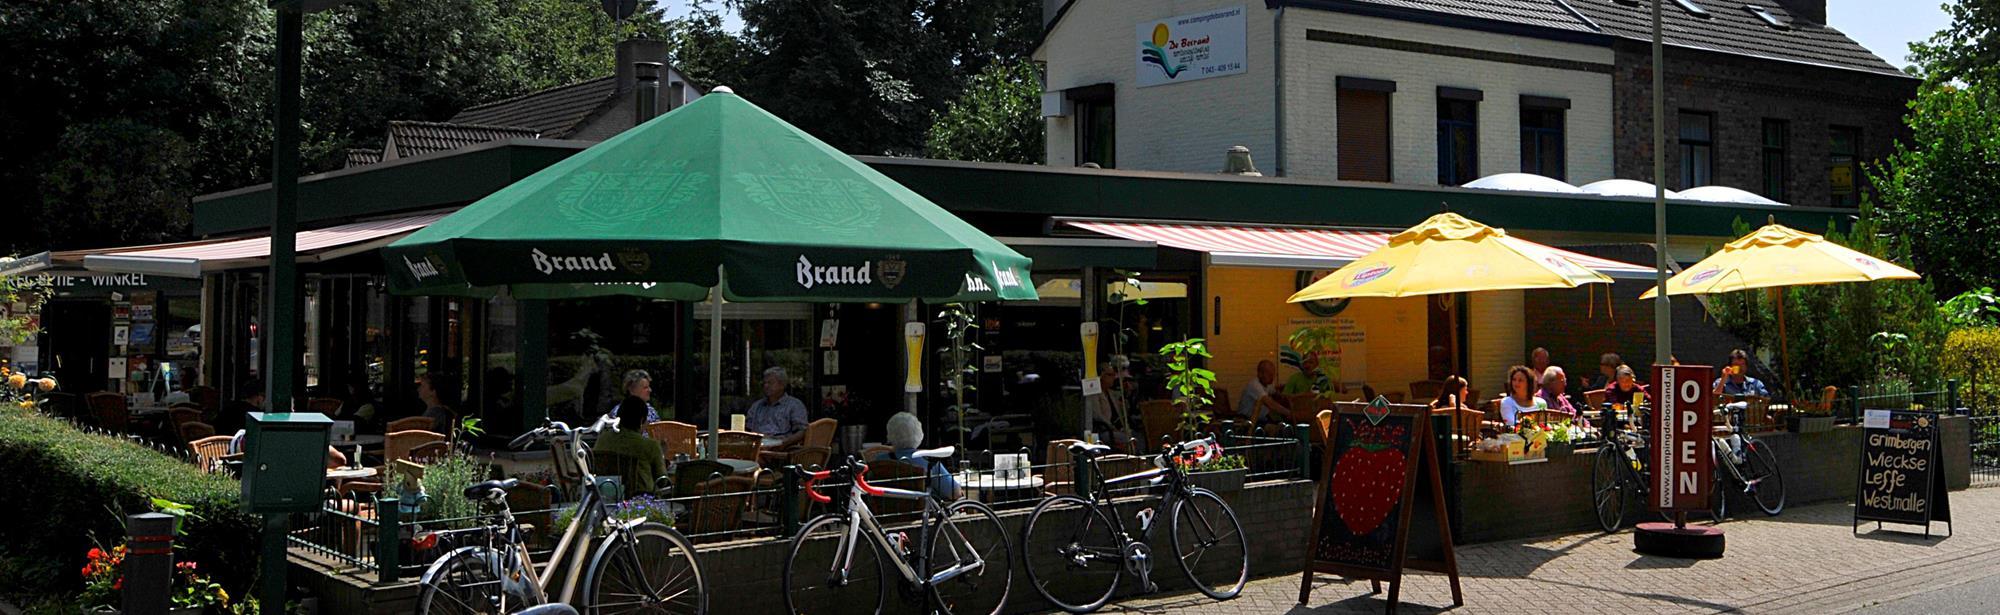 Sint Geertruid MTB-route